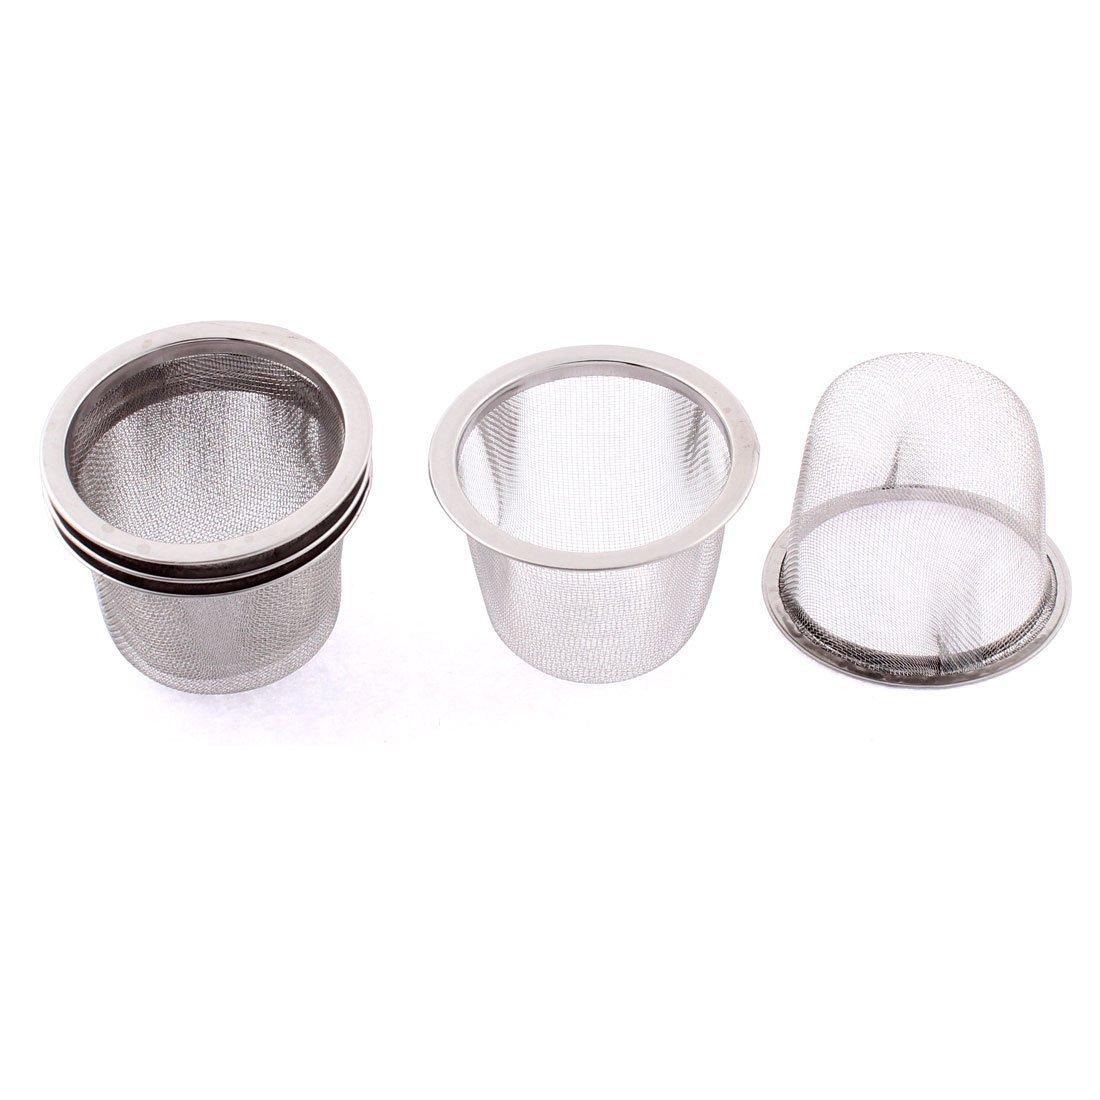 SODIAL Stainless Steel Home Mesh Tea Infuser Strainer Basket 62mm Dia 5 Pcs